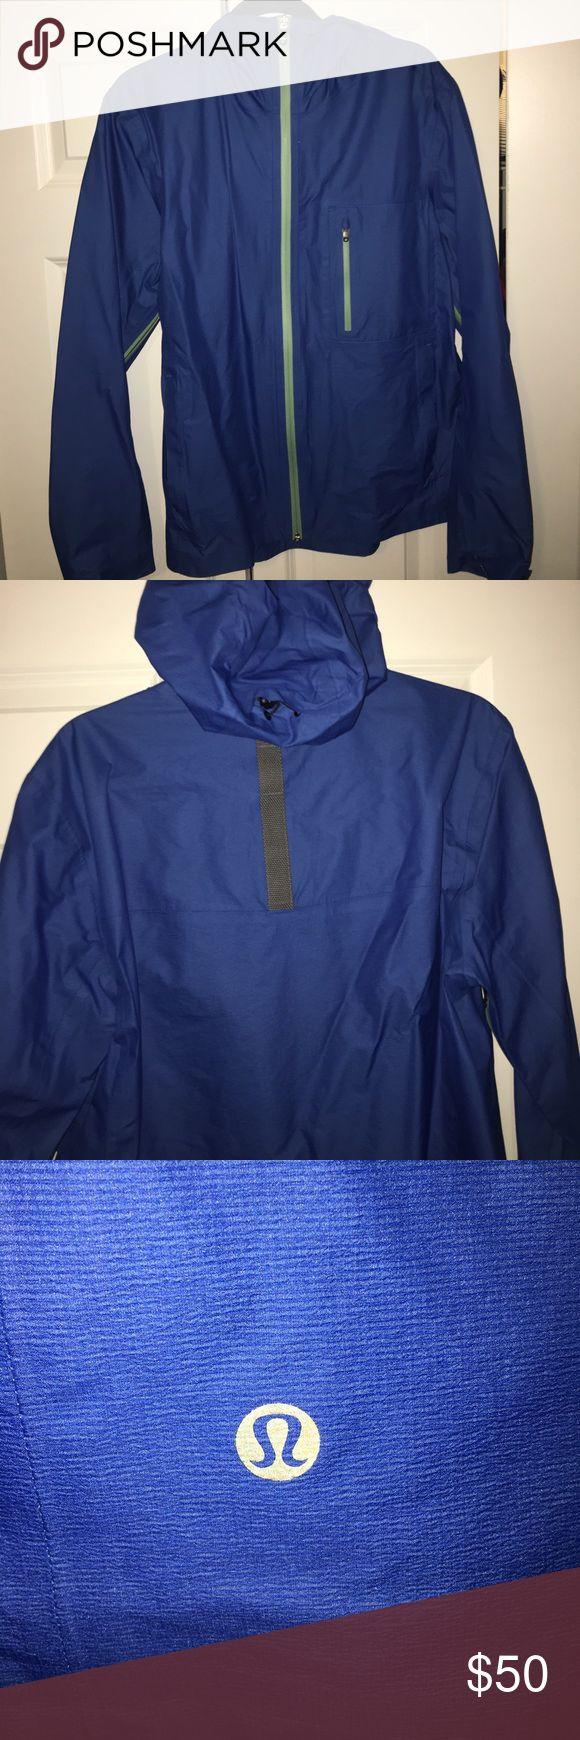 Men's Medium Lululemon Rain jacket Men's Medium Lululemon Rain jacket. Worn only once. Perfect for running and working out when the weathers a little rainy lululemon athletica Jackets & Coats Raincoats